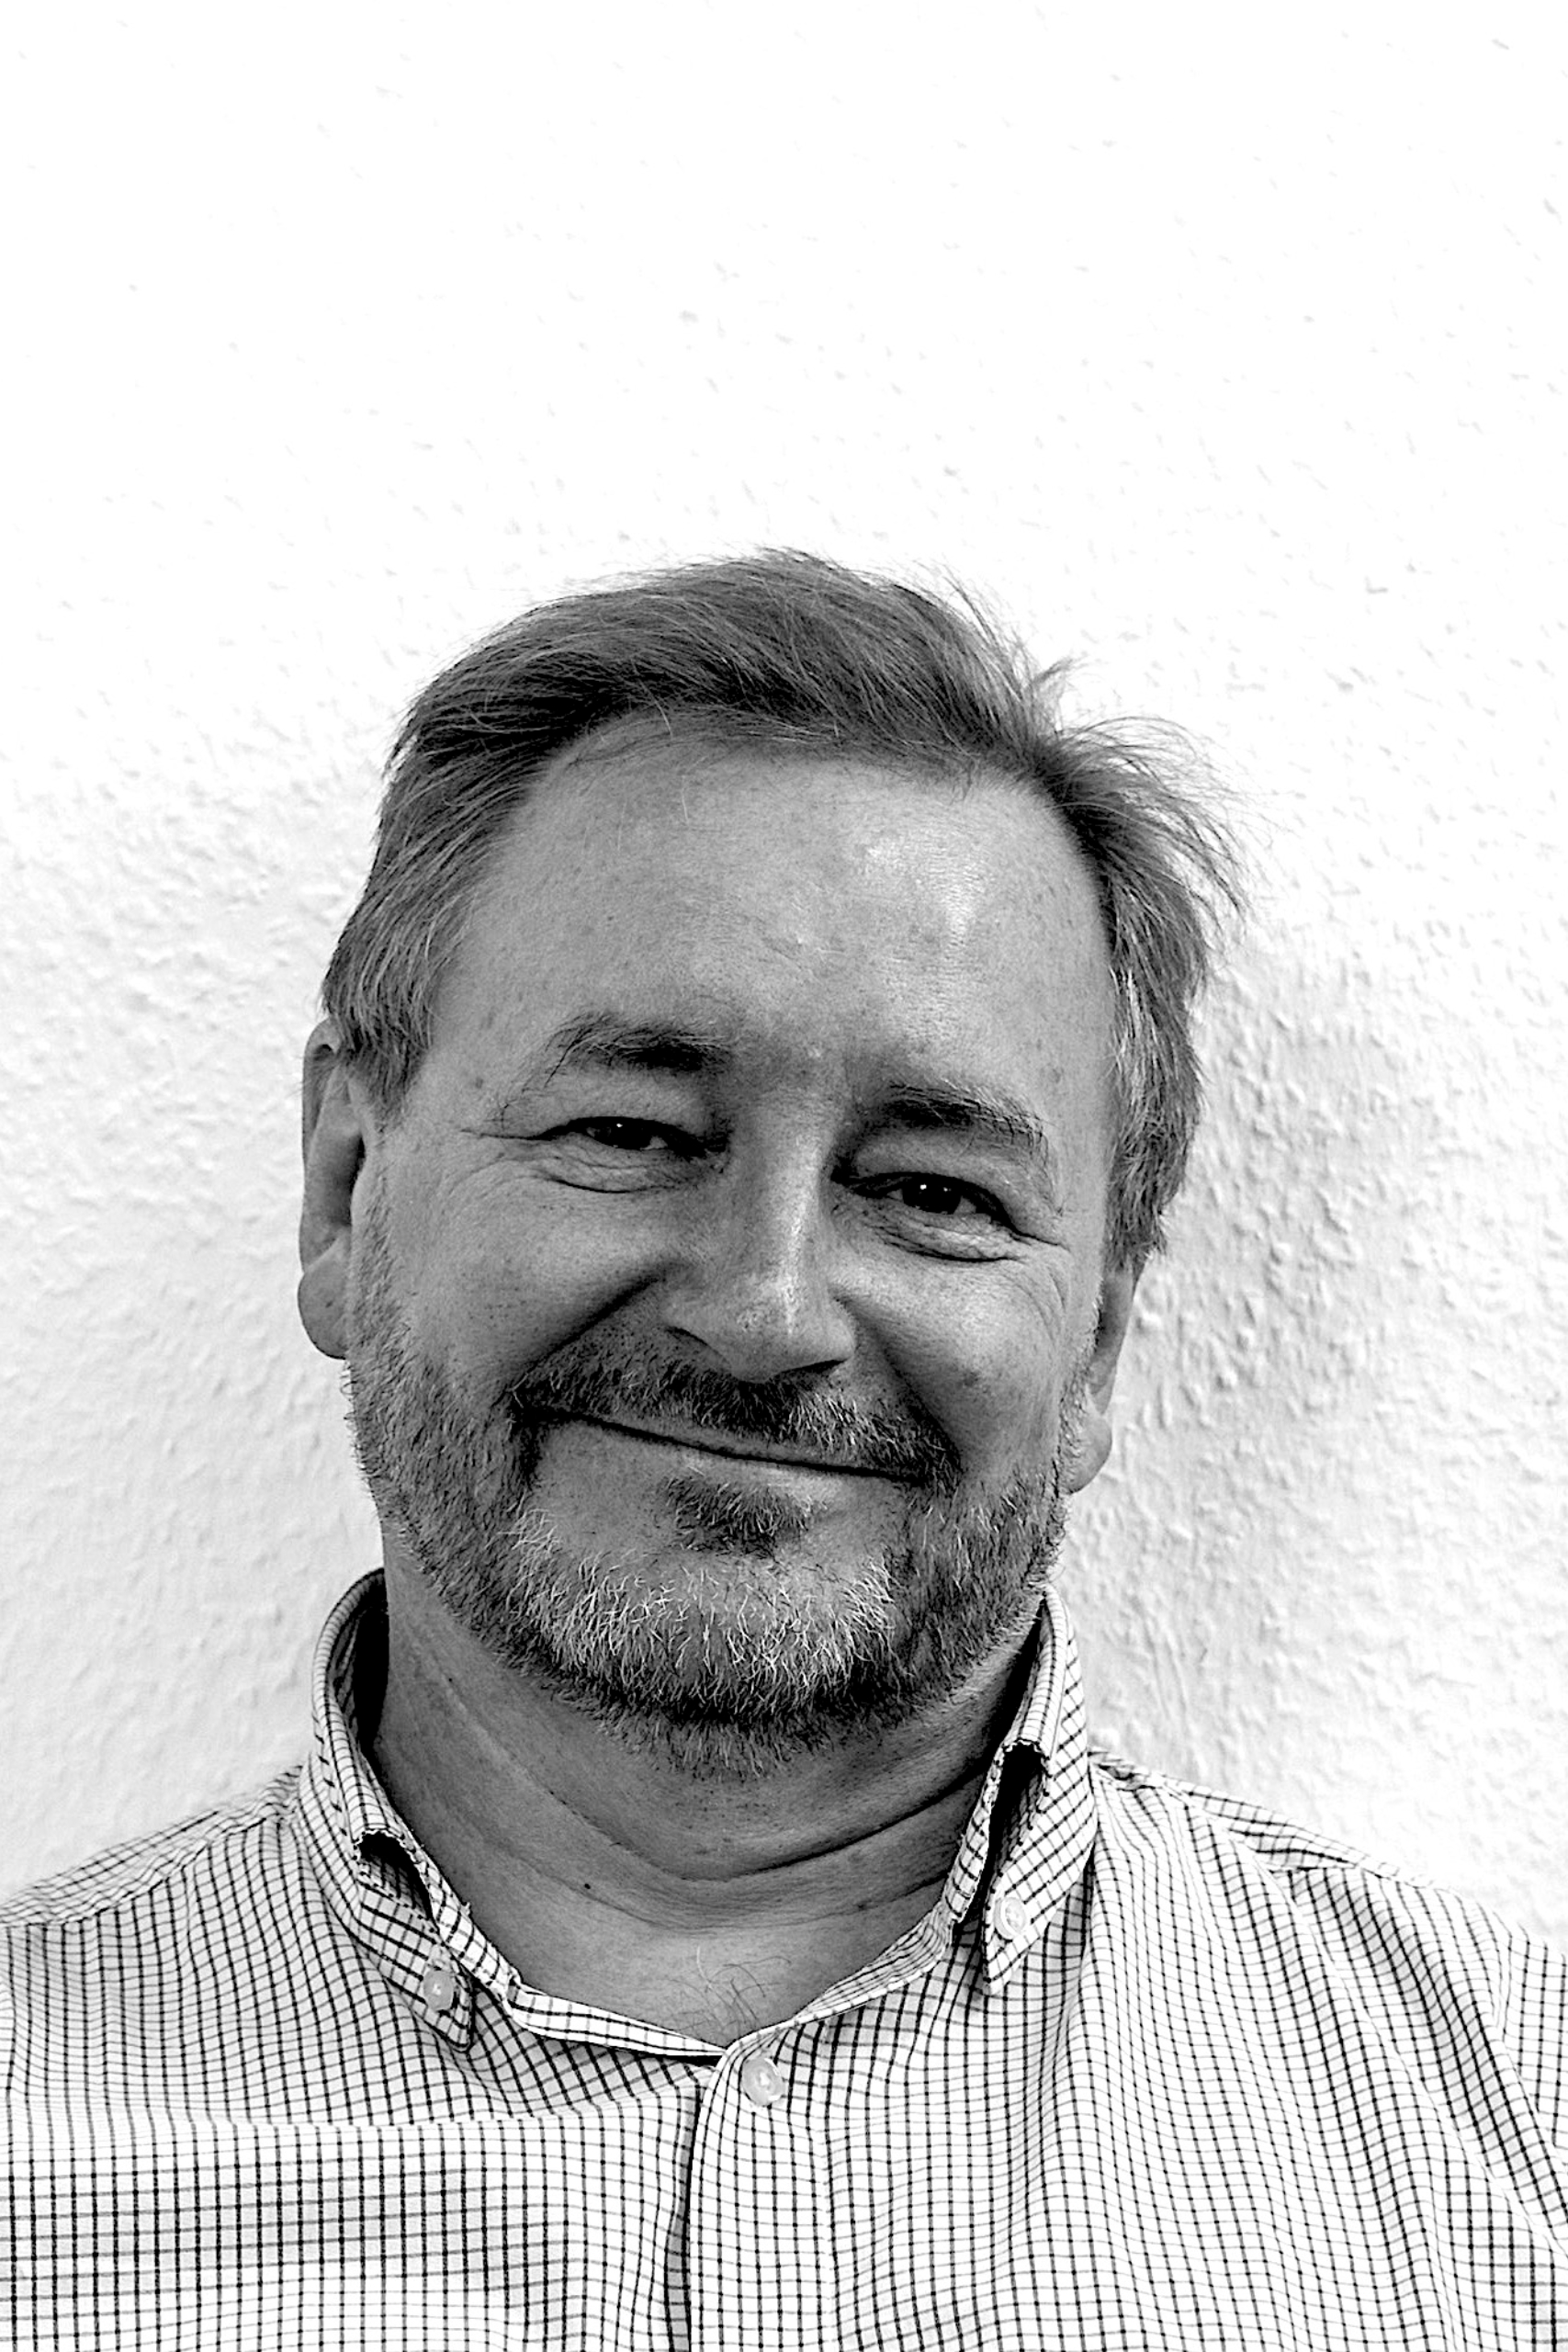 Portraitfoto von Klaus Peter Küßner